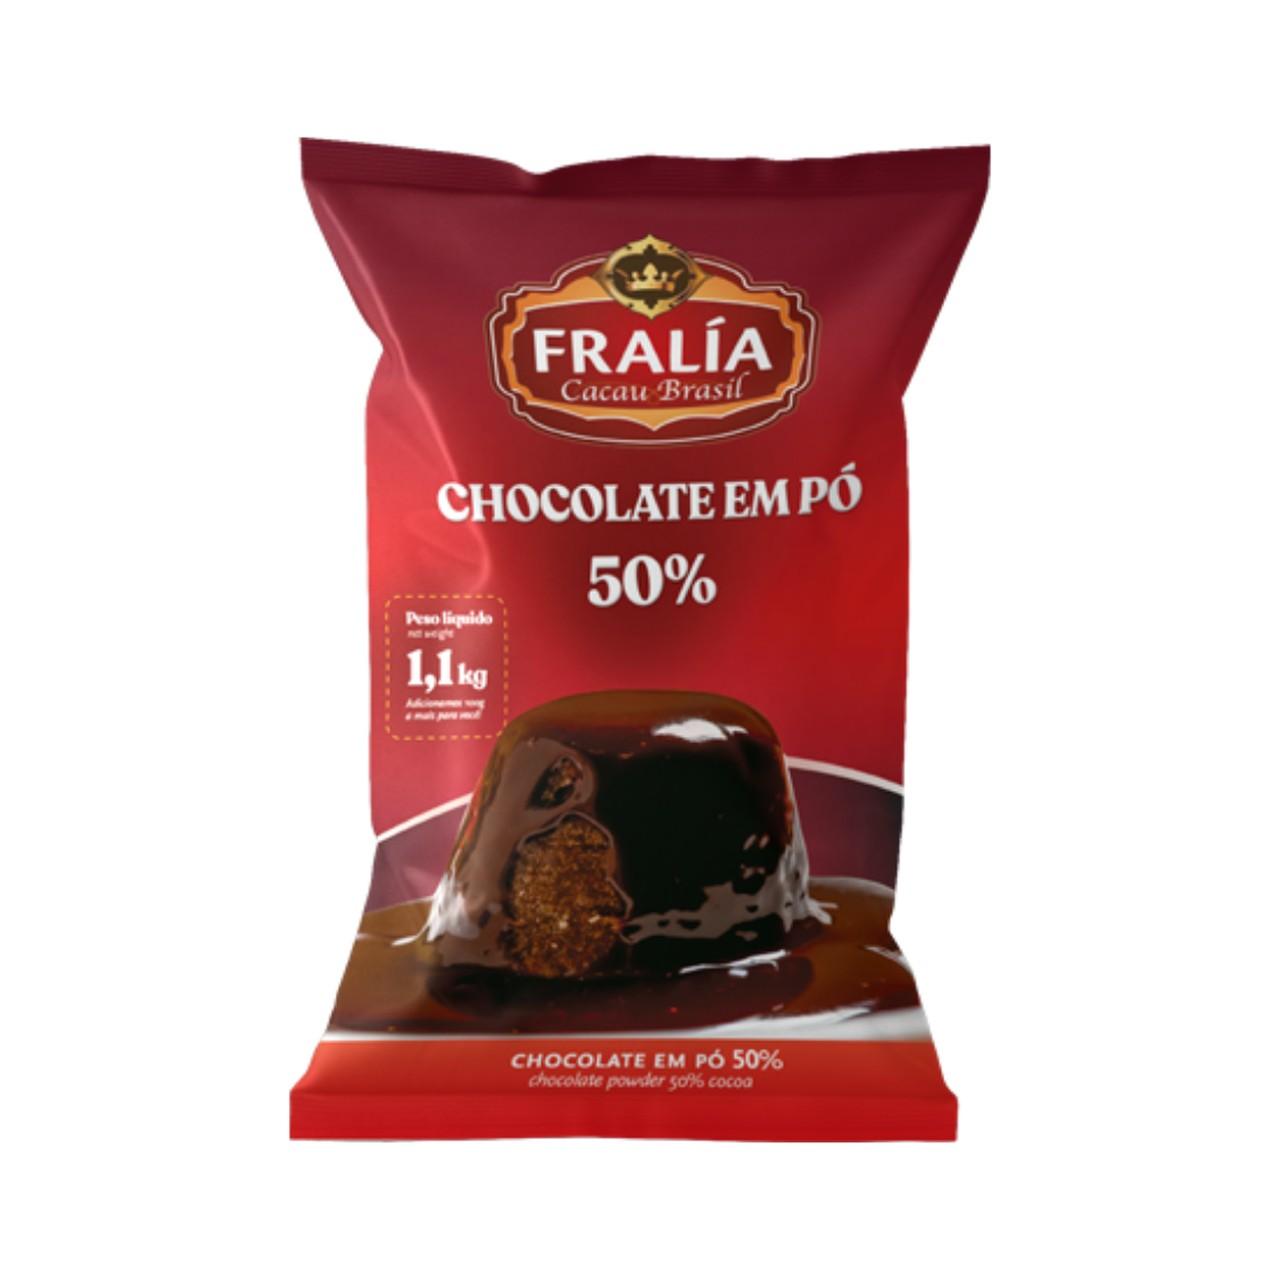 Chocolate Em Pó Solúvel 50% Cacau Fralía Adicel - 1,1 Kg